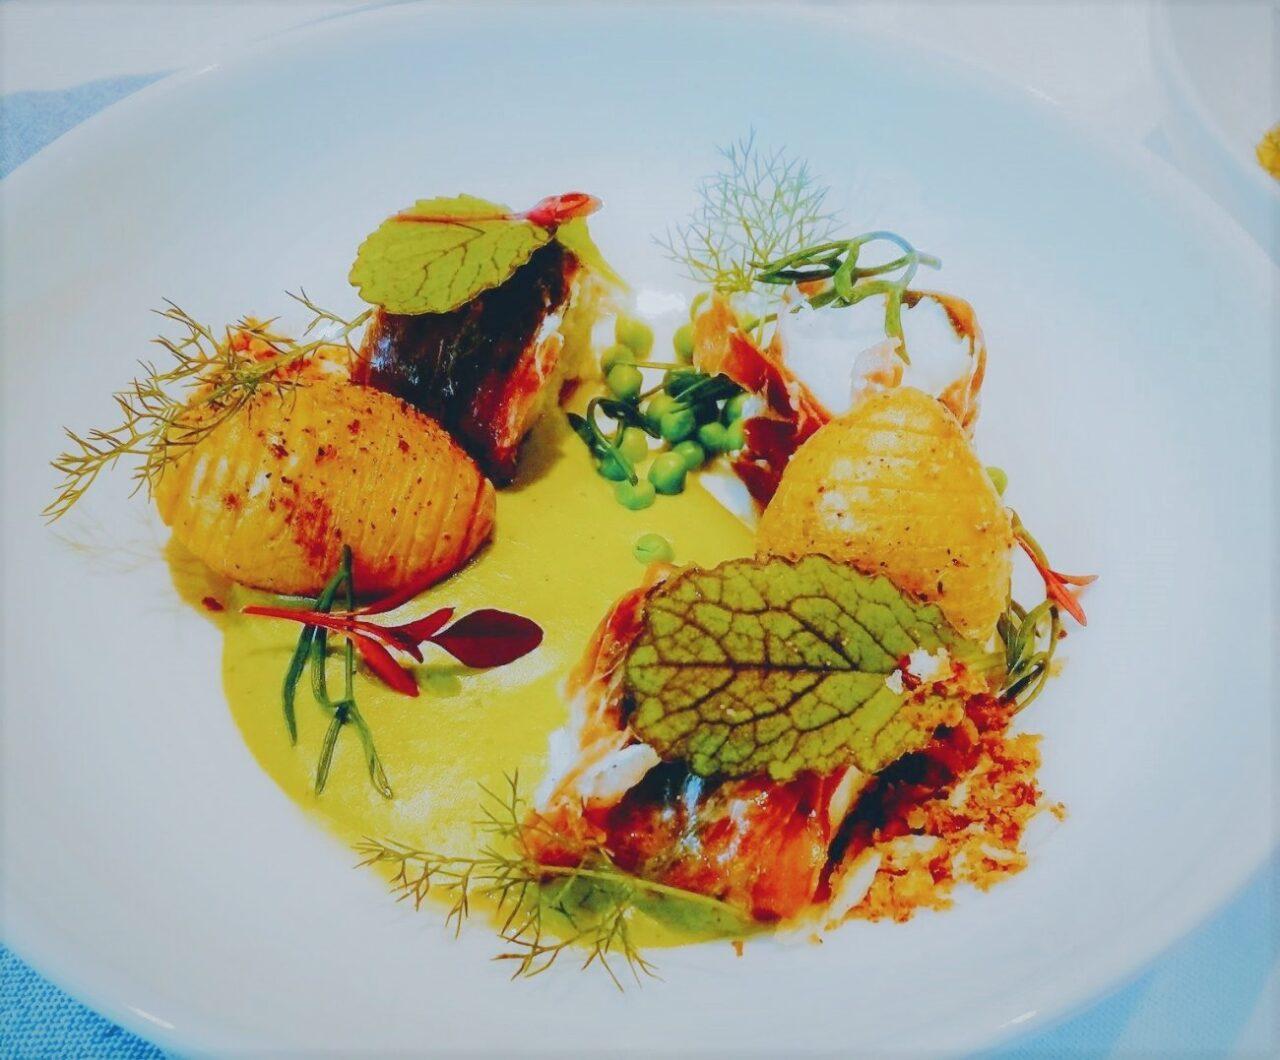 Zeeduivel, prosciutto, erwtencrème en hasselback aardappelen